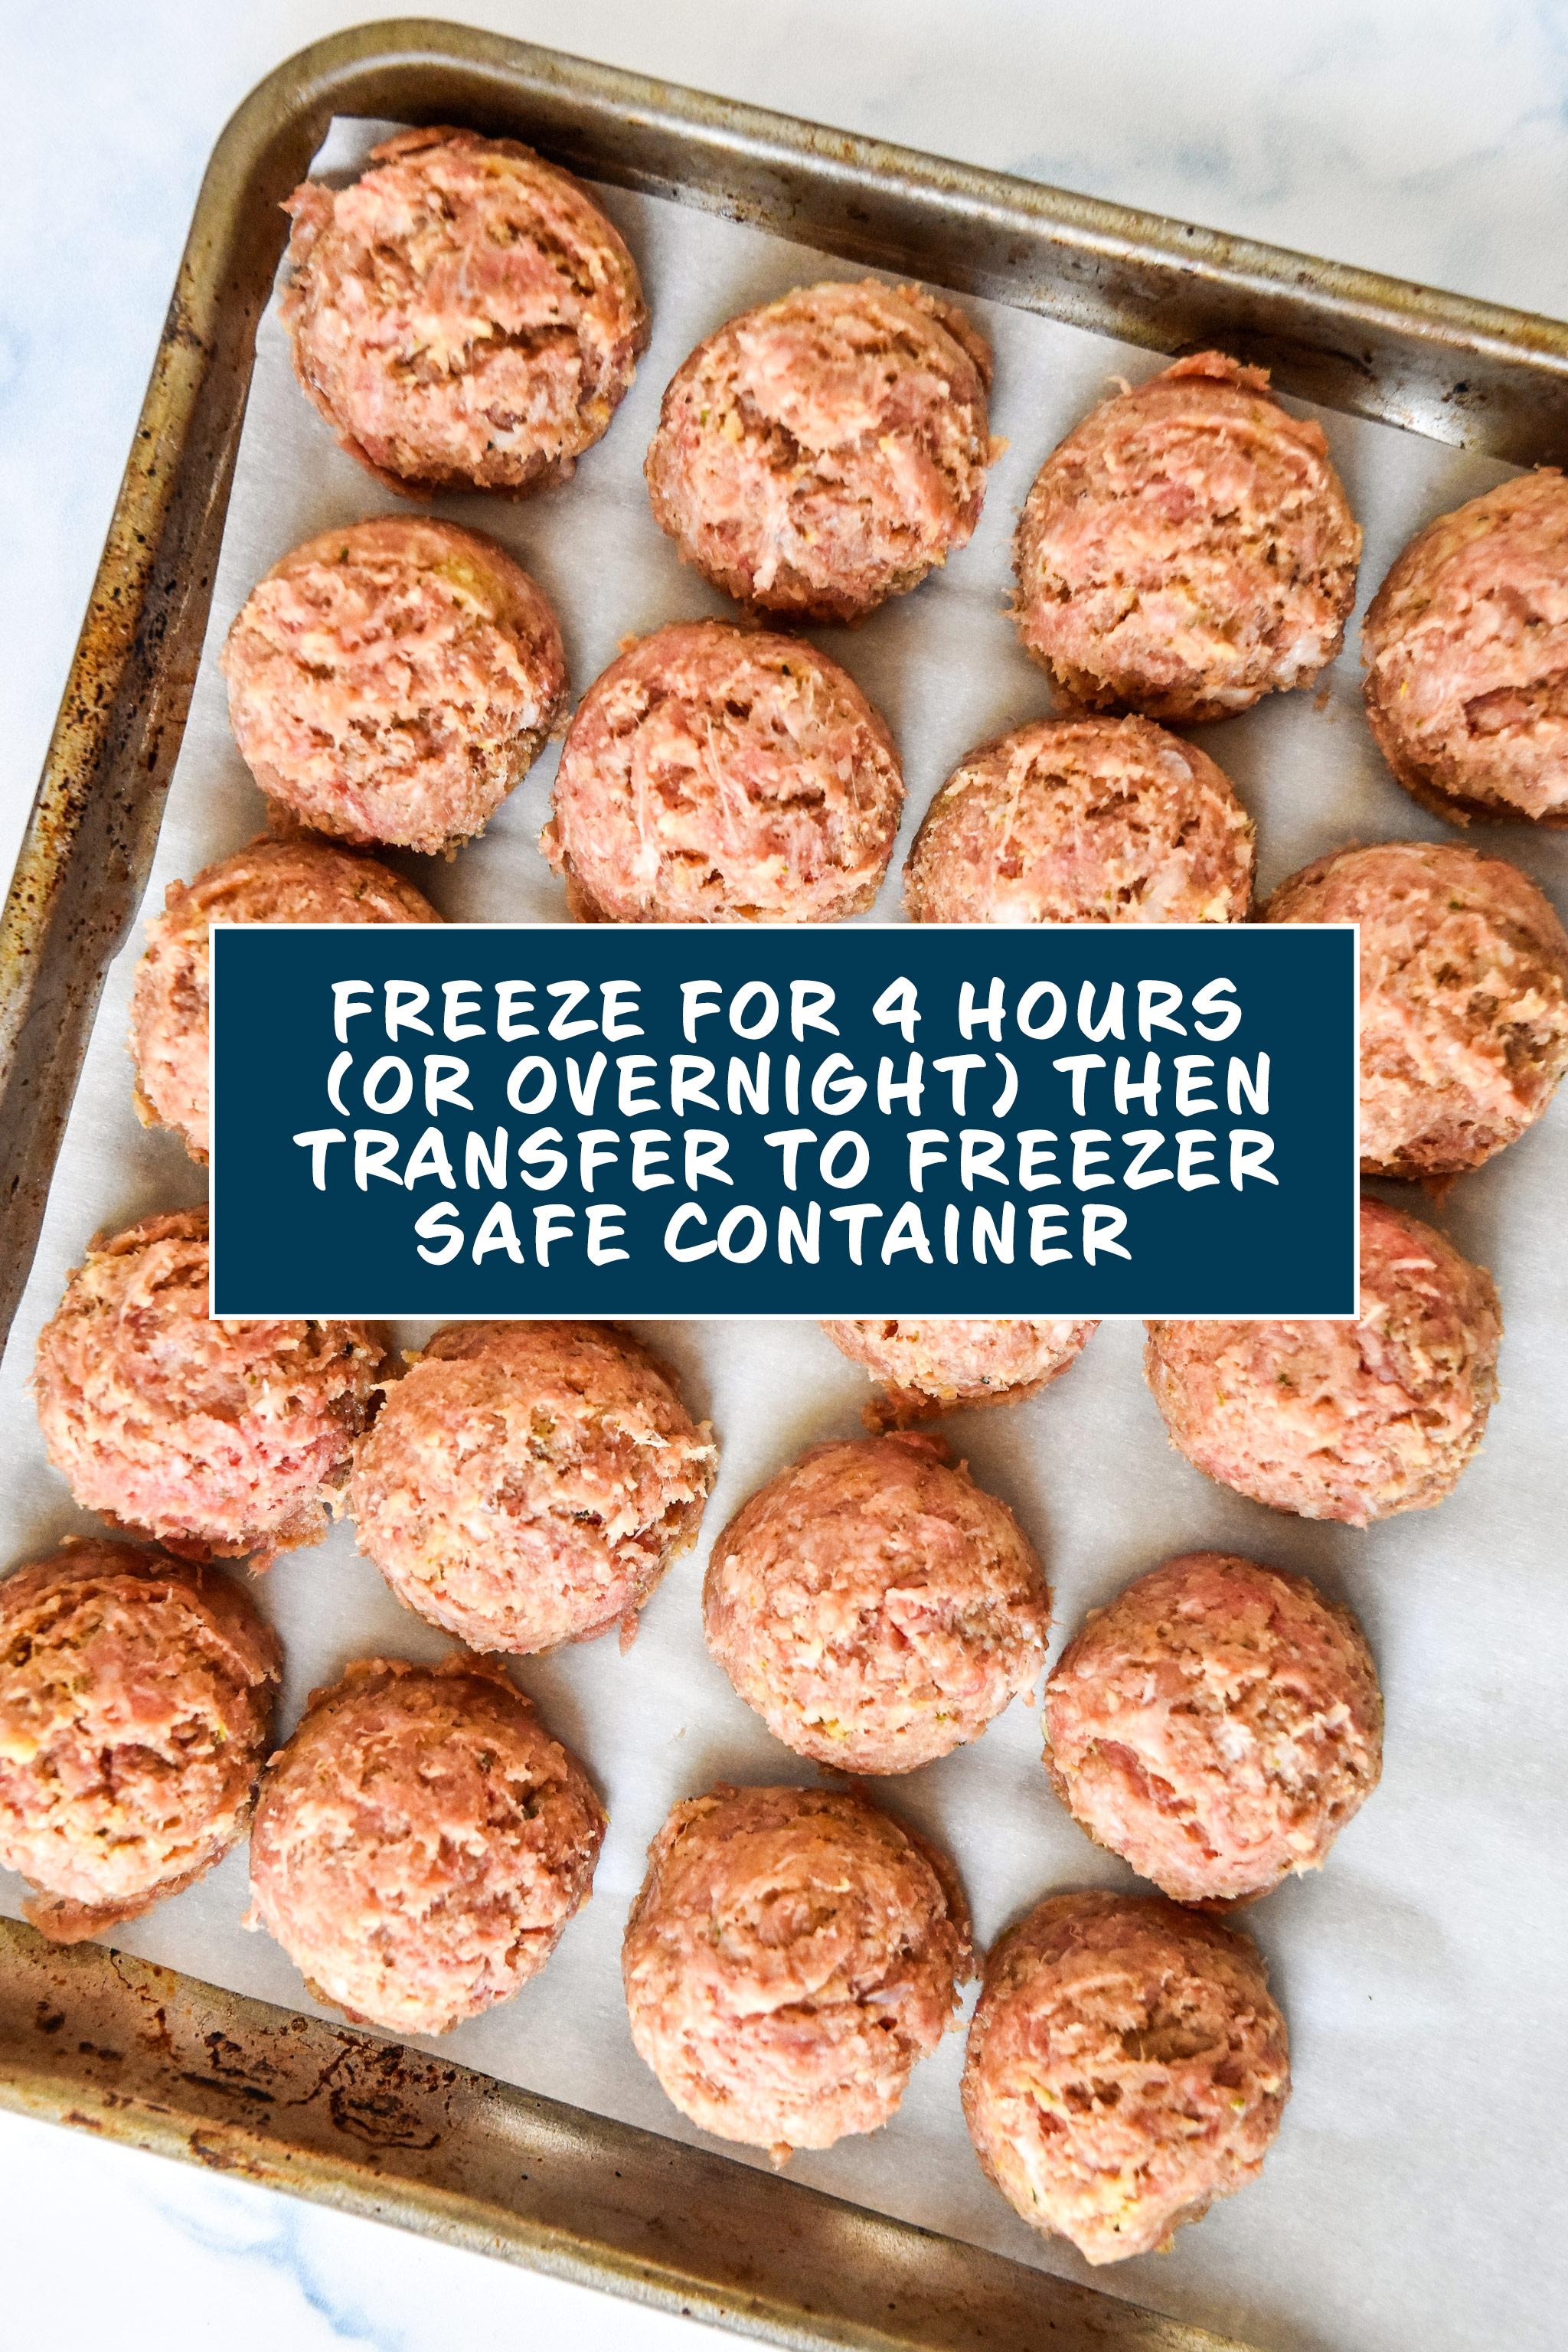 easy freezer friendly meatballs on a sheet pan frozen overnight.